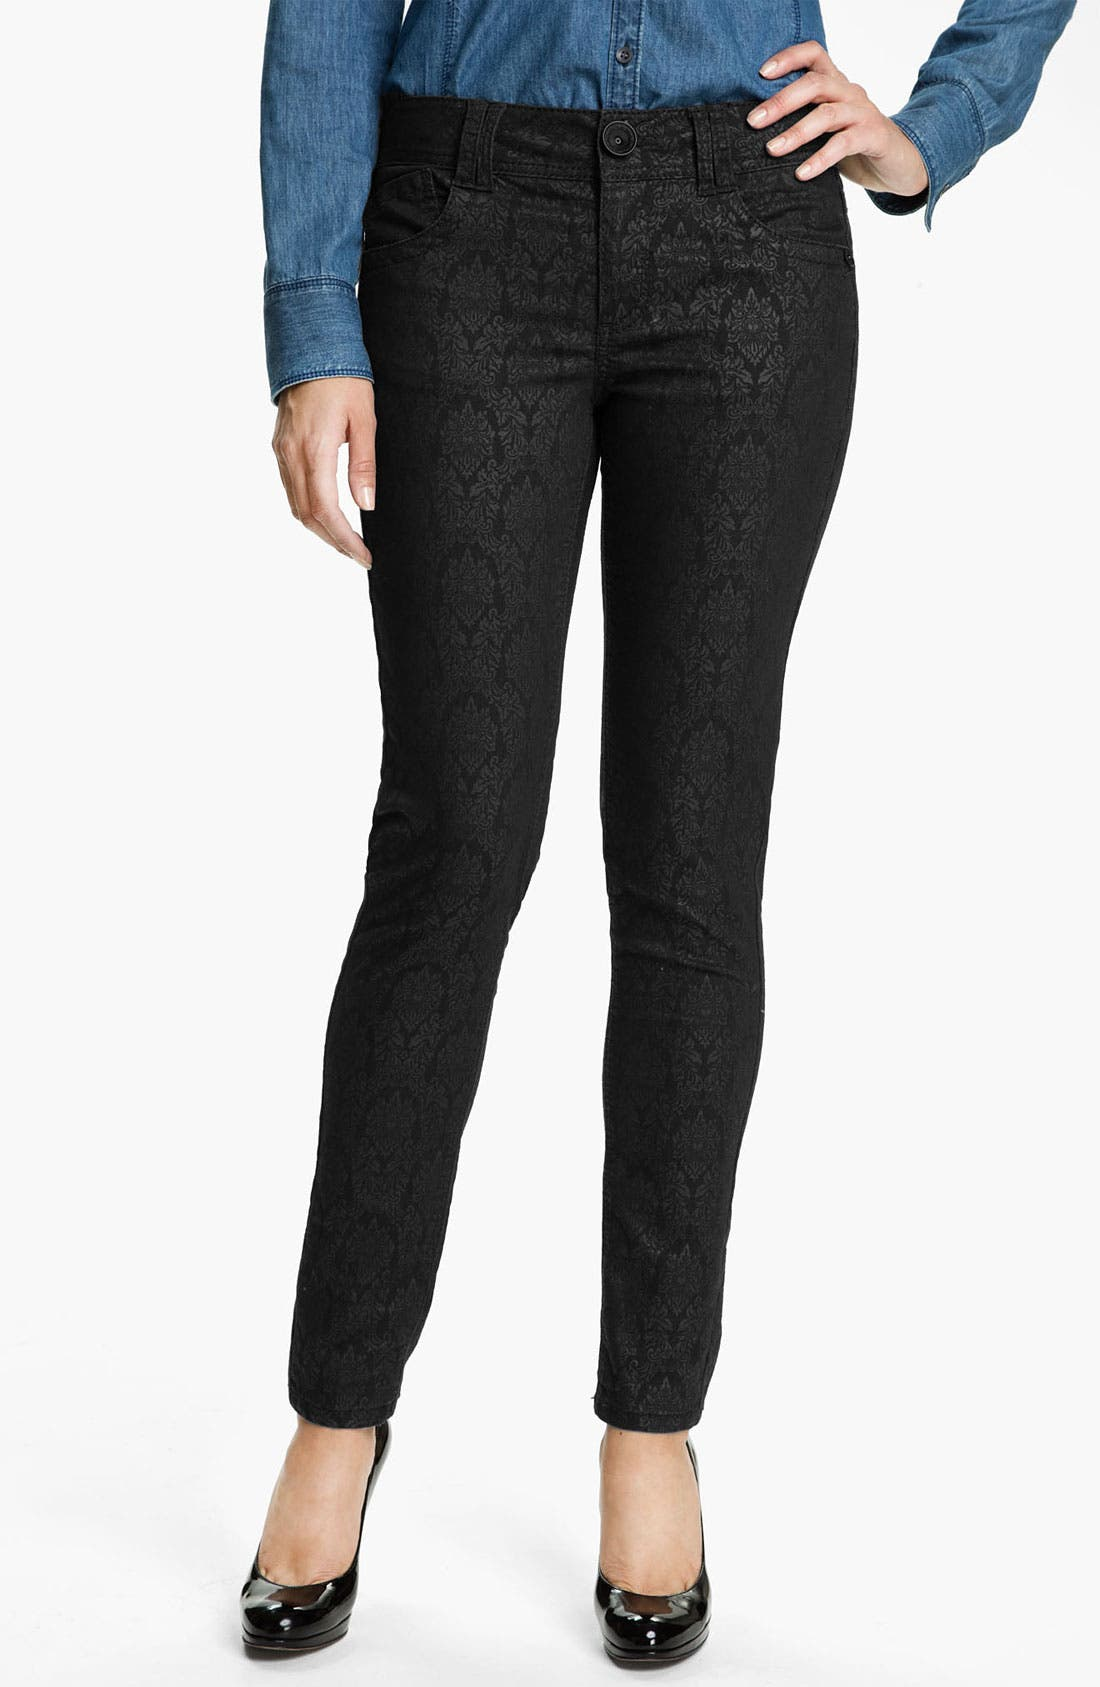 Alternate Image 1 Selected - Wit & Wisdom Brocade Print Skinny Jeans (Black) (Nordstrom Exclusive)